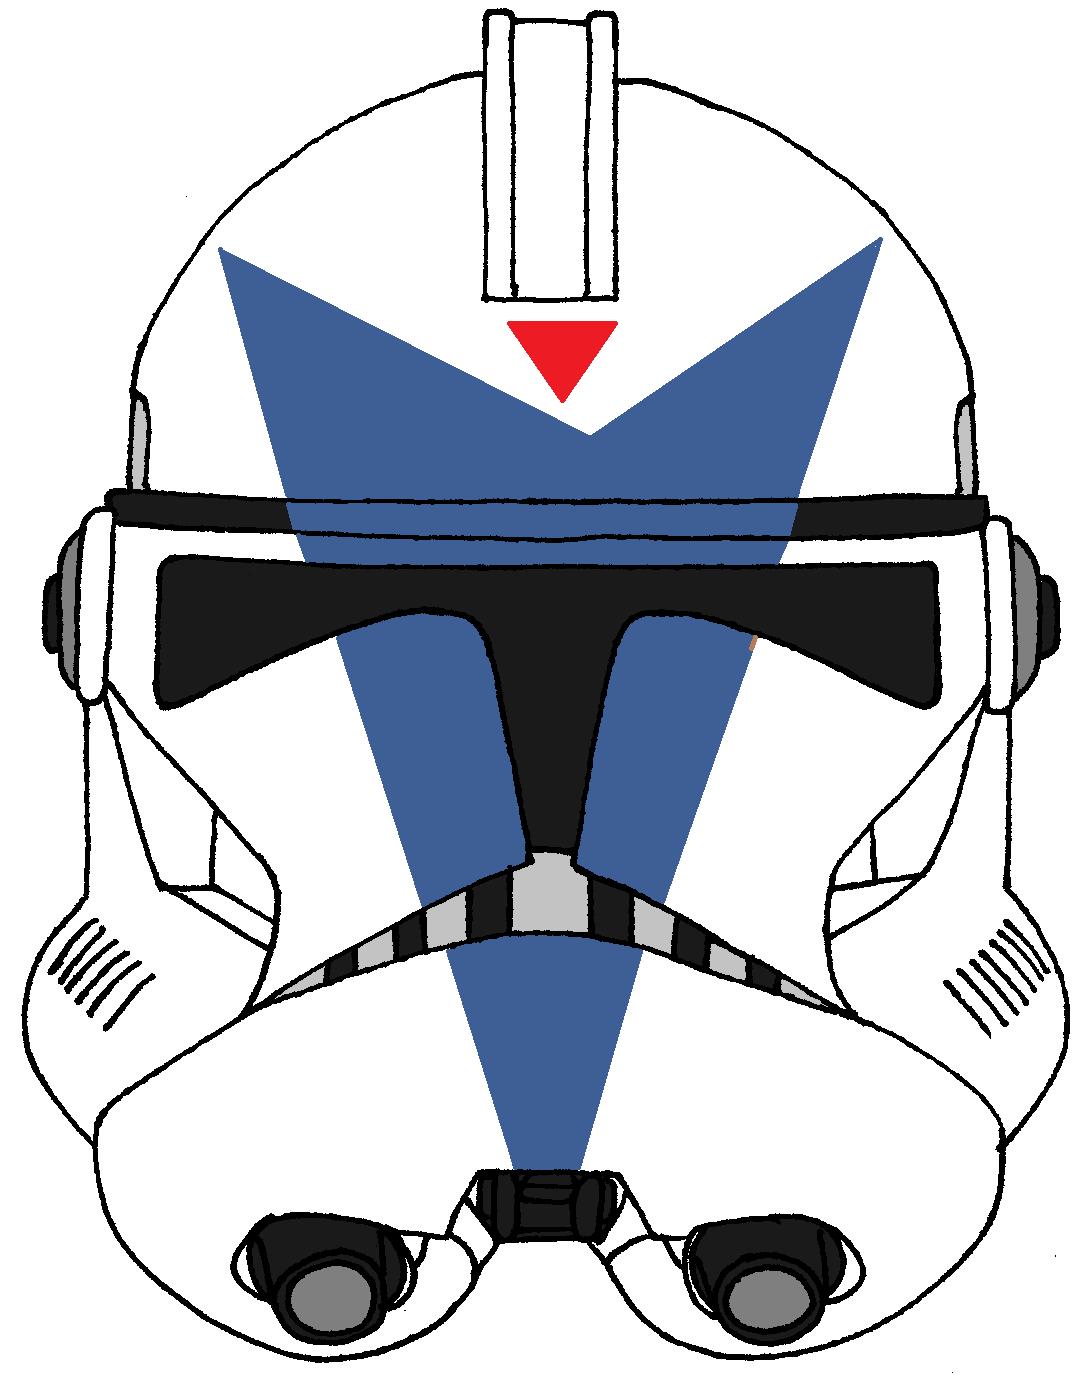 Clone Trooper Dogma S Helmet Star Wars Artwork Star Wars Clone Wars Star Wars Helmet